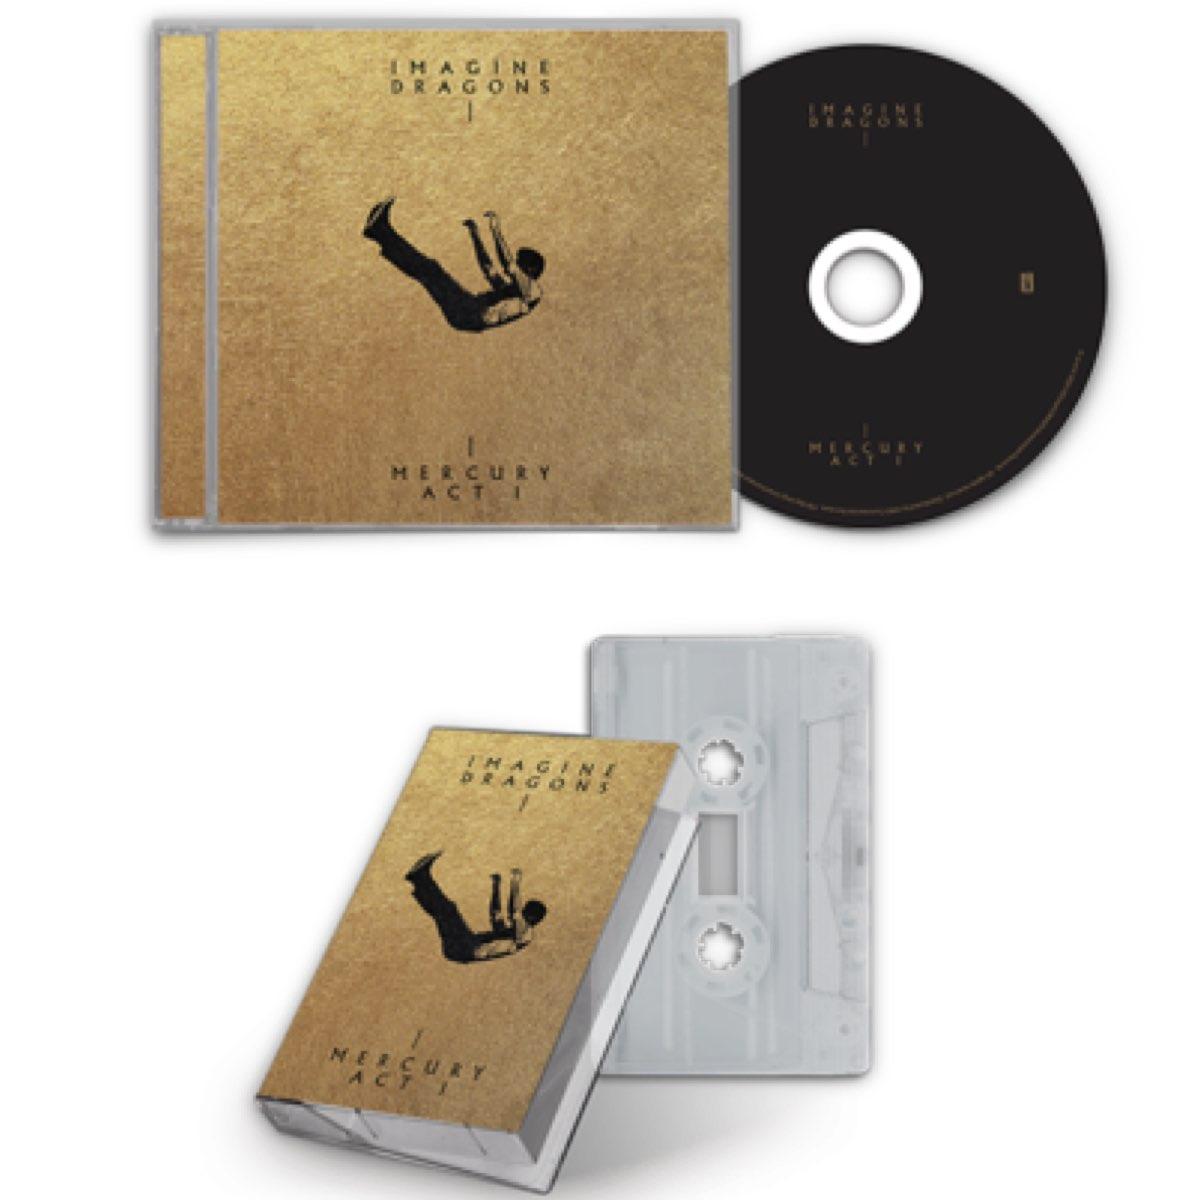 Imagine Dragons - Mercury: Act 1 [Combo CD + Fita K7 + Card Autografado]